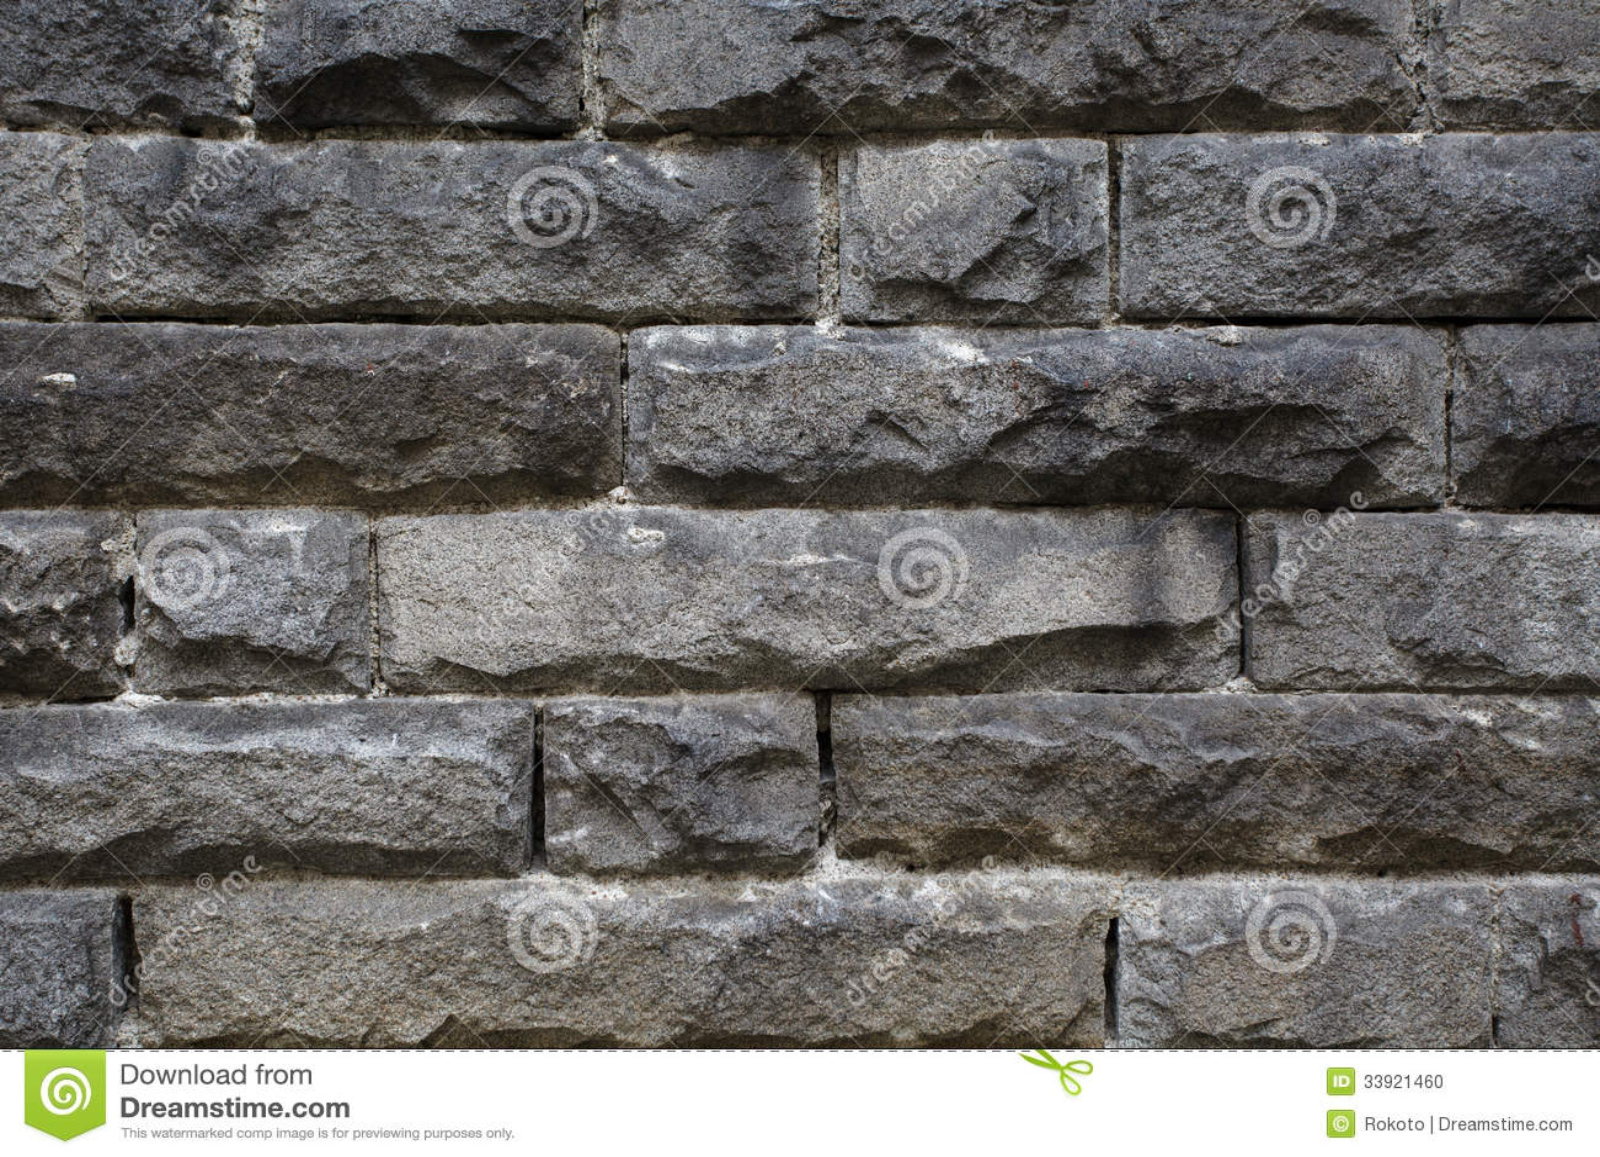 Rough Granite Stone : Rough granite stone wall stock photo image